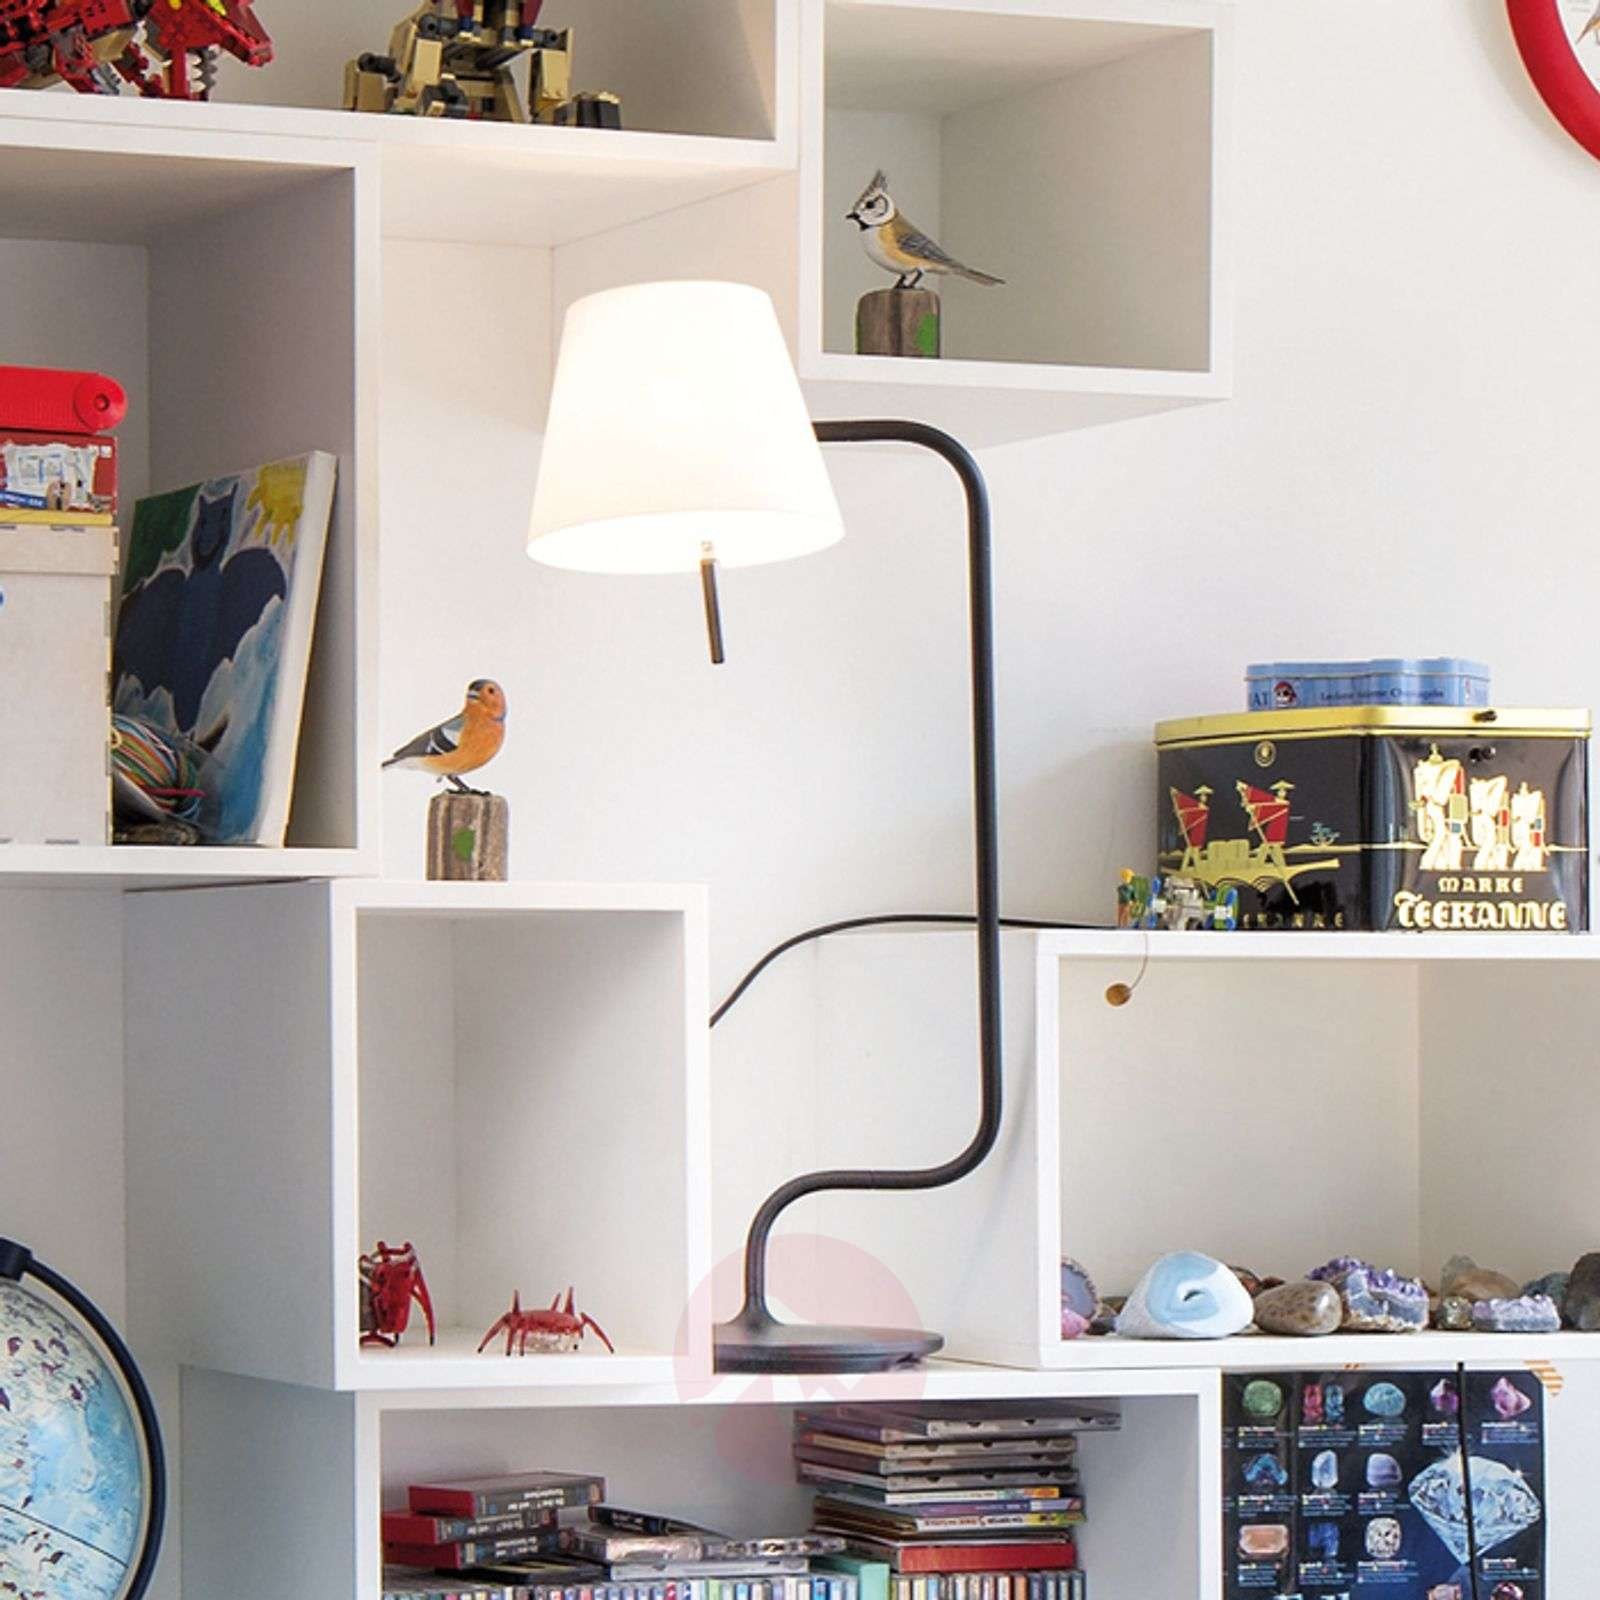 Versatile designer table lamp Elane-8550018-01